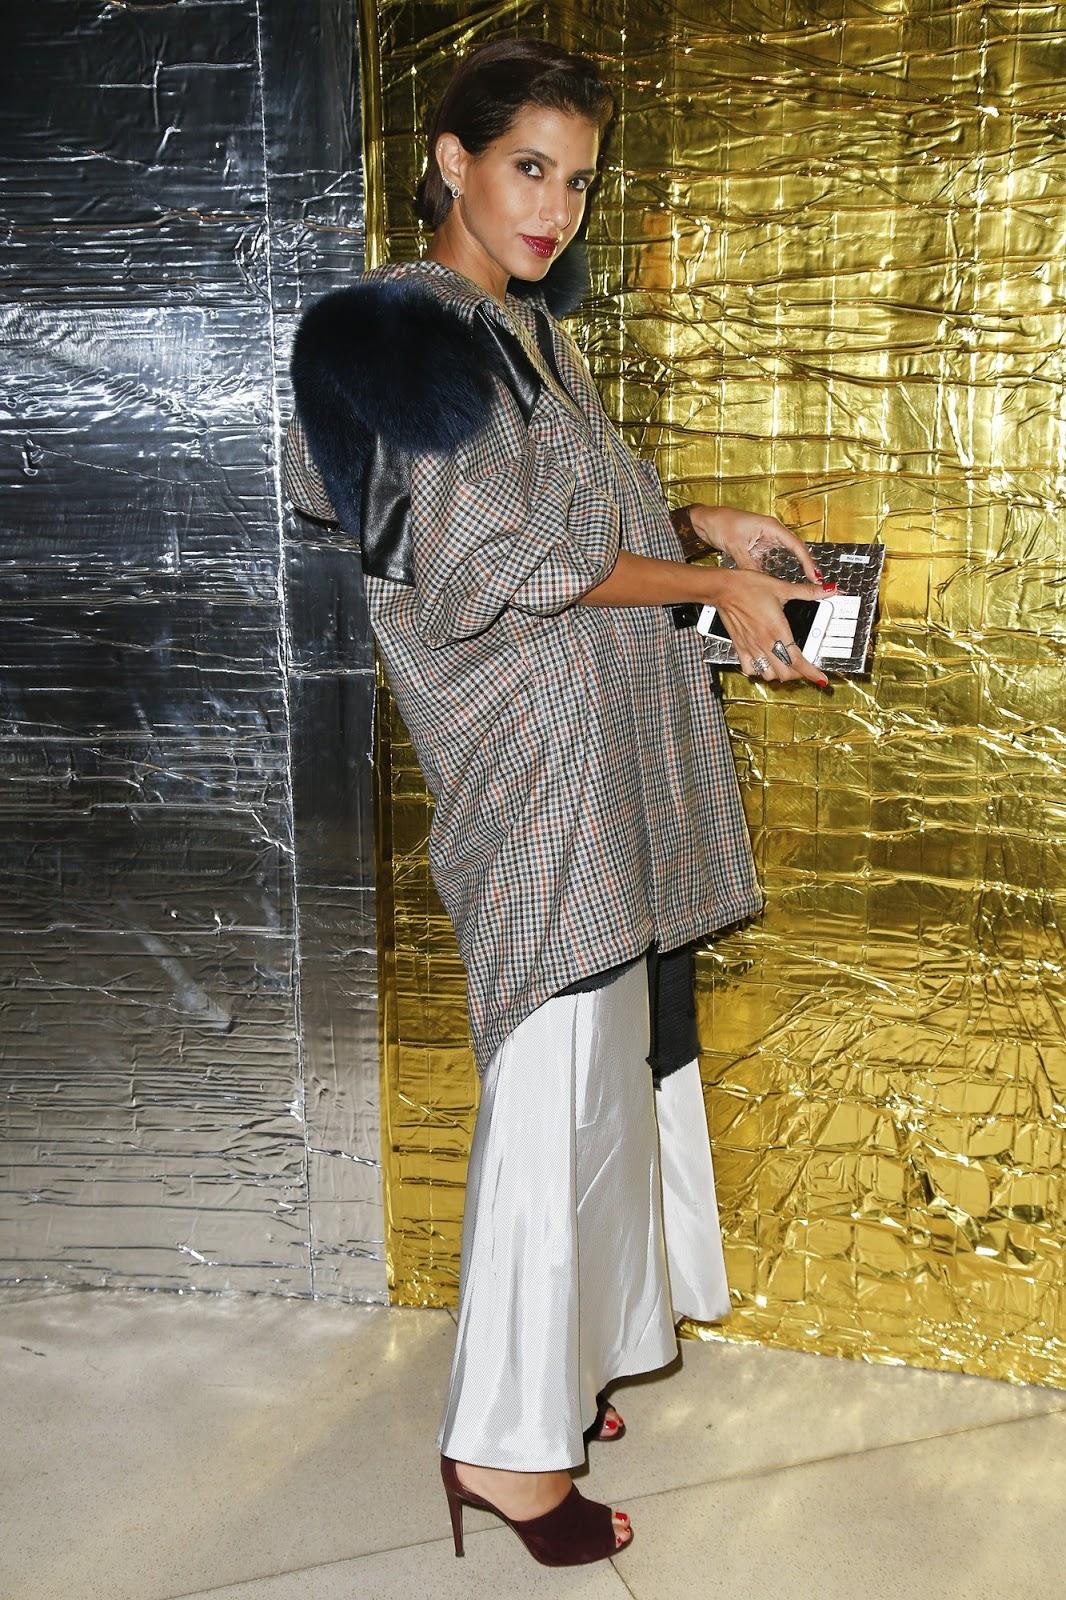 Miss Vendella_Inspire me_Princess Deena Abdulaziz_style